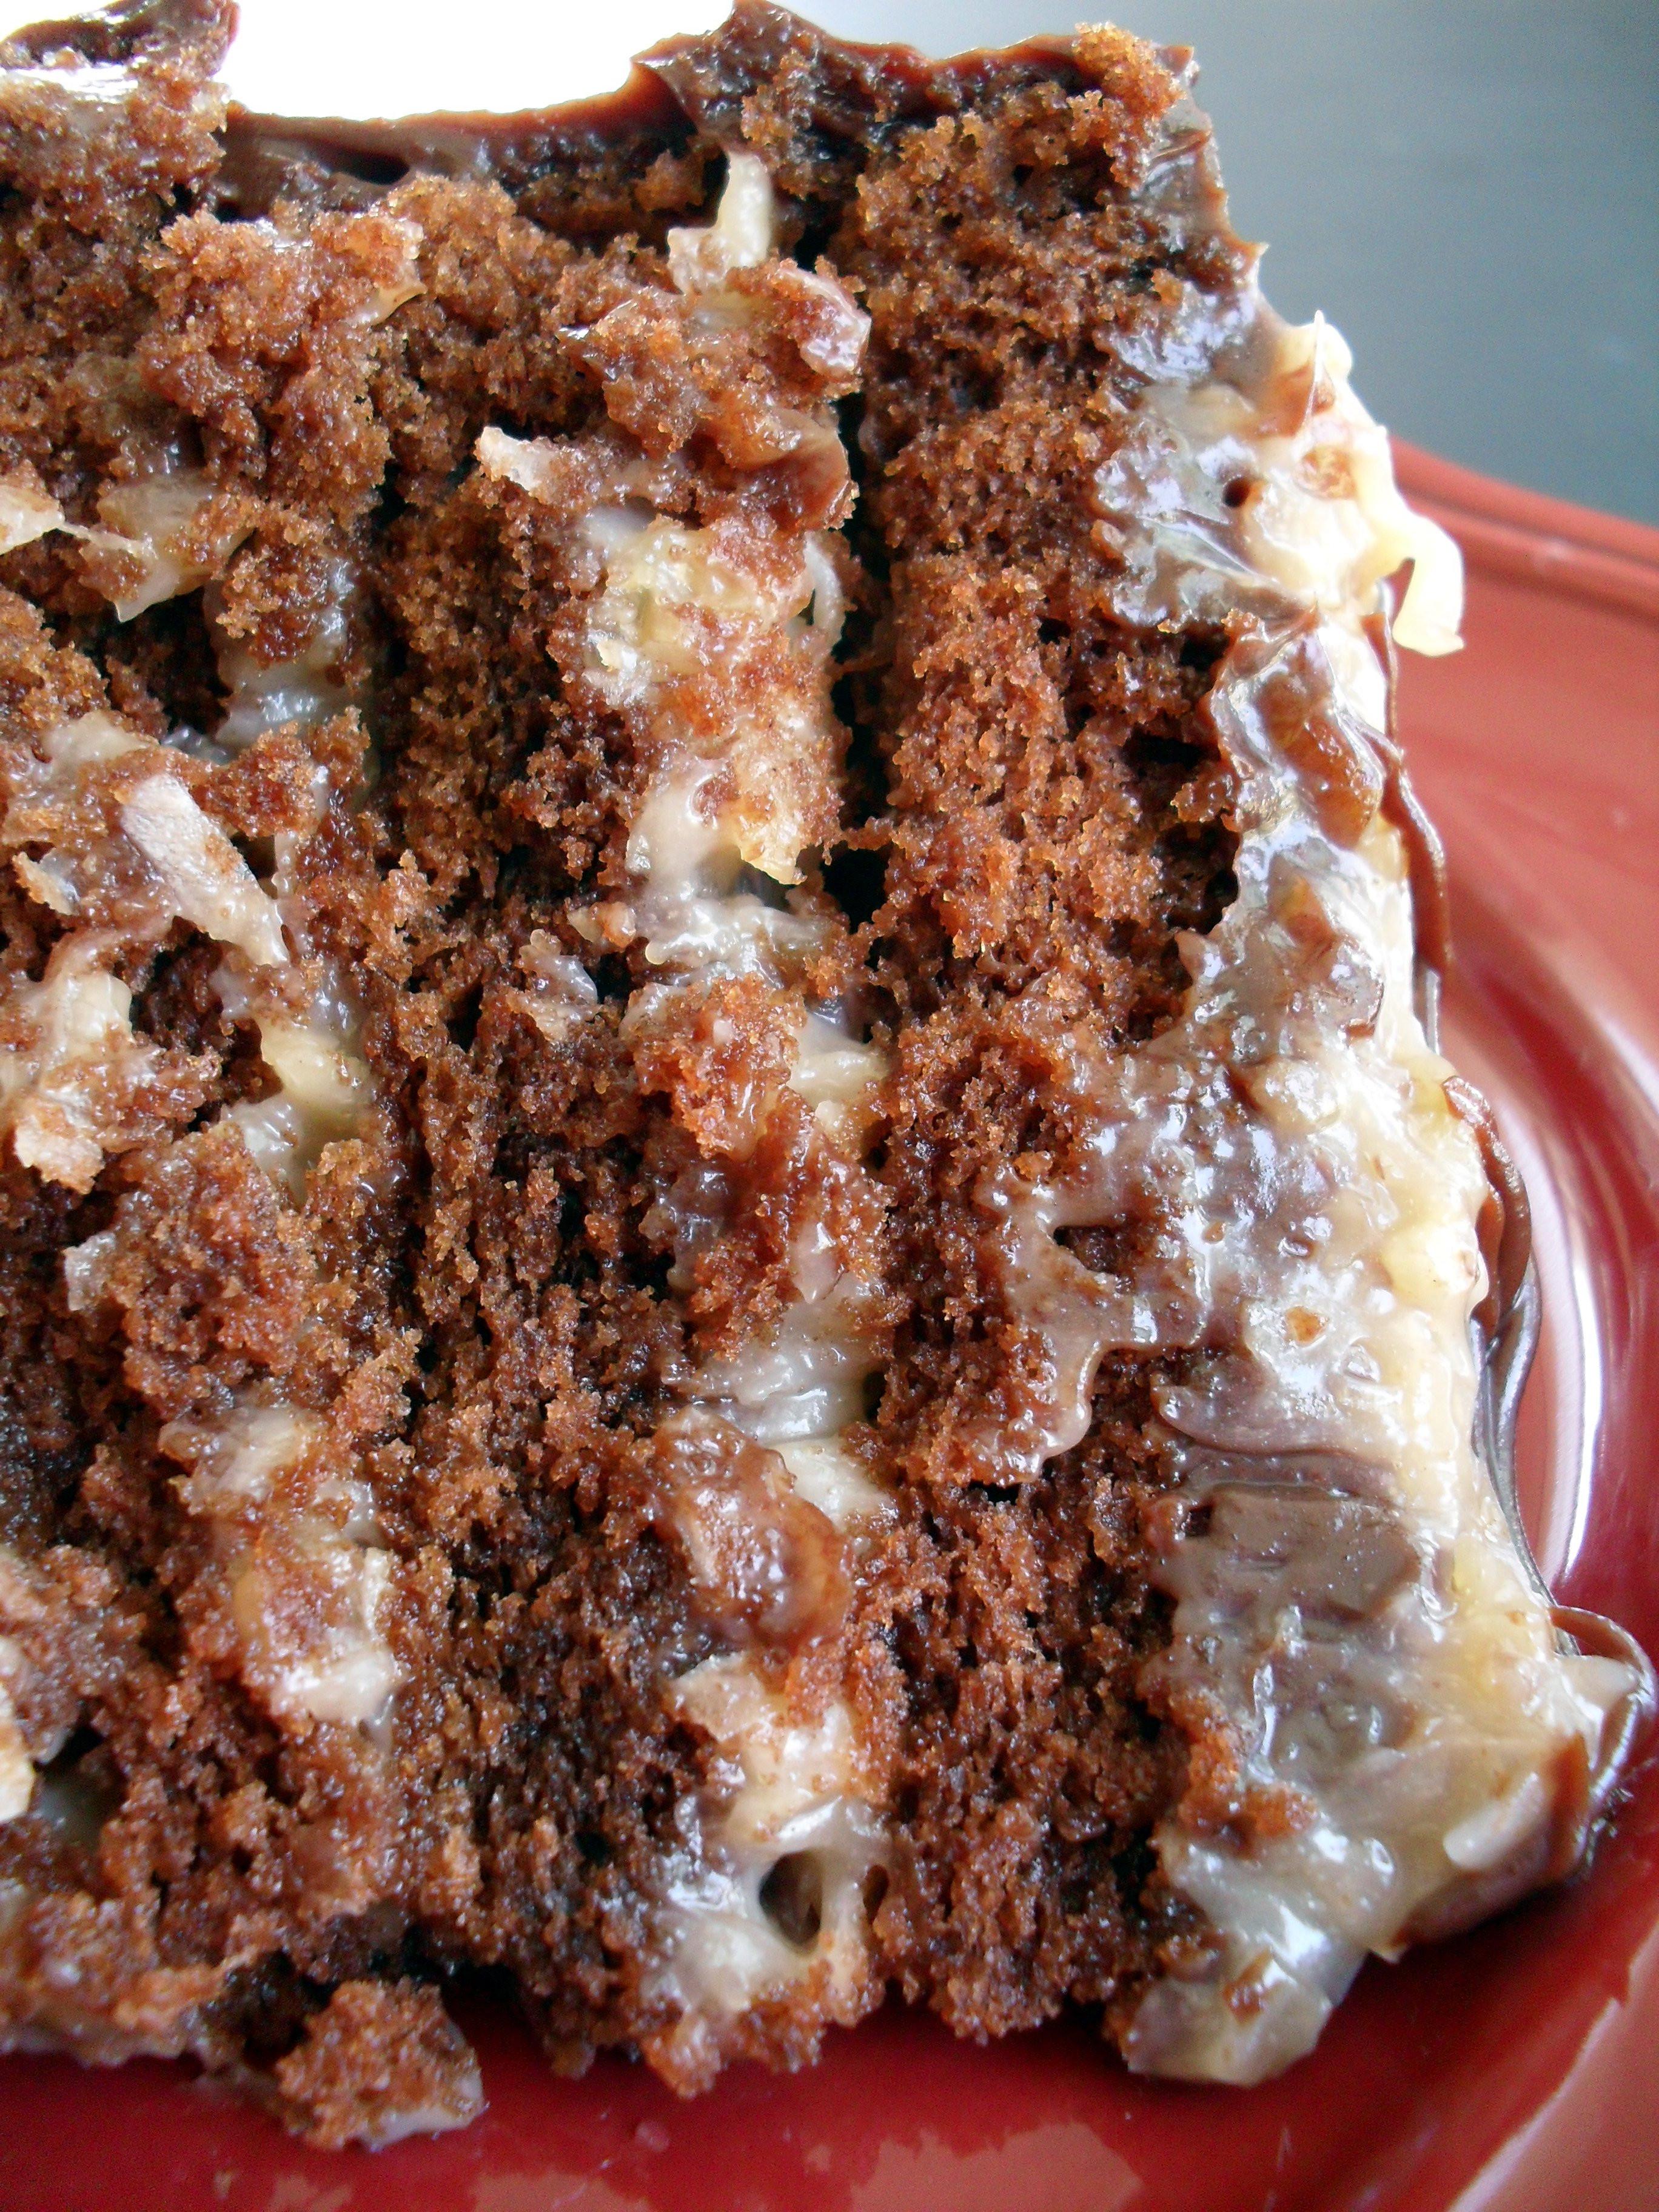 German Chocolate Cake  David Lebovitz's German Chocolate Cake